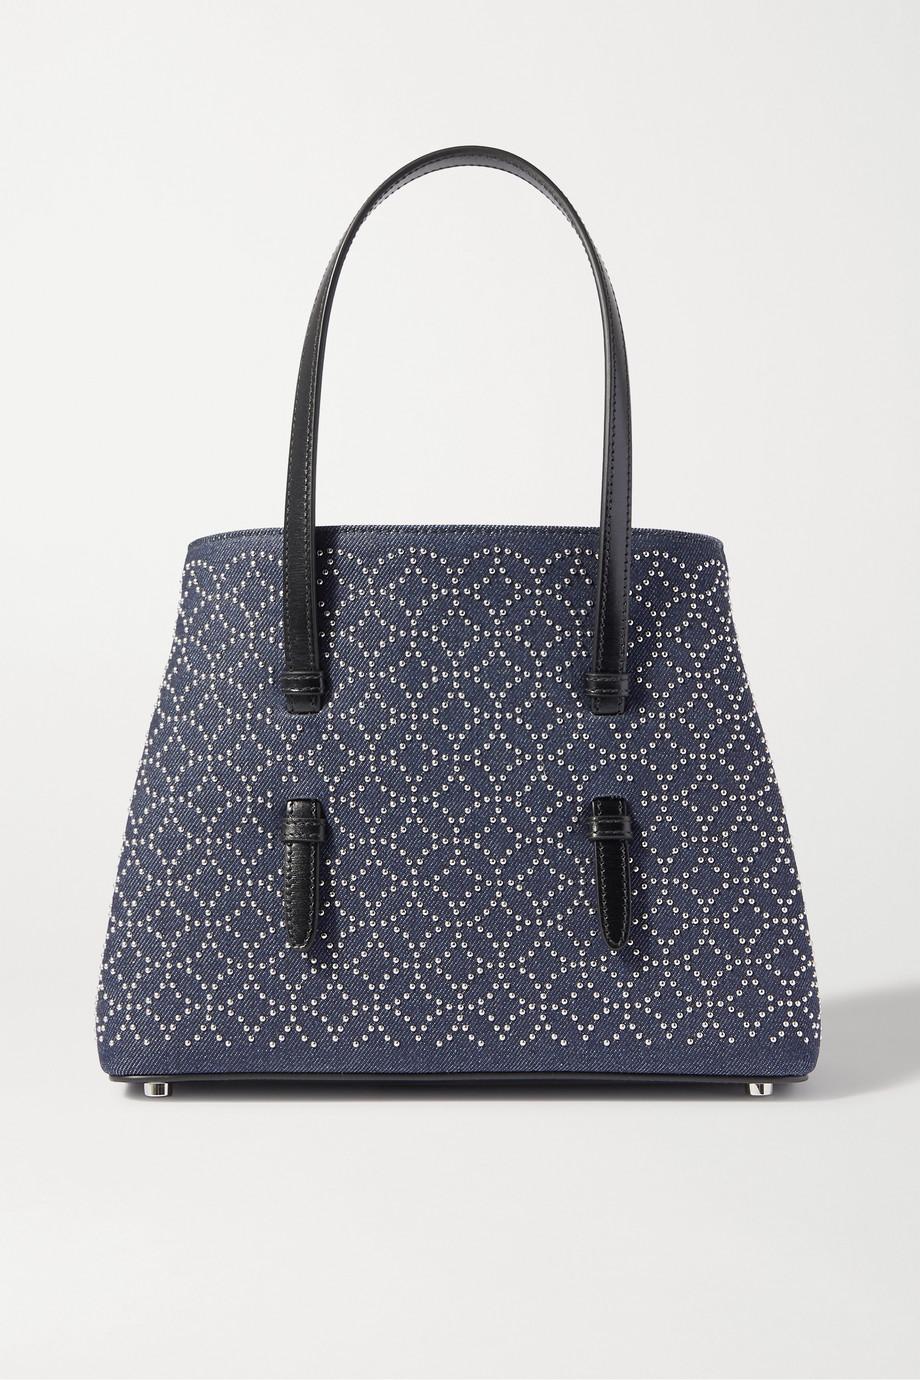 Alaïa Mina medium leather-trimmed studded denim tote